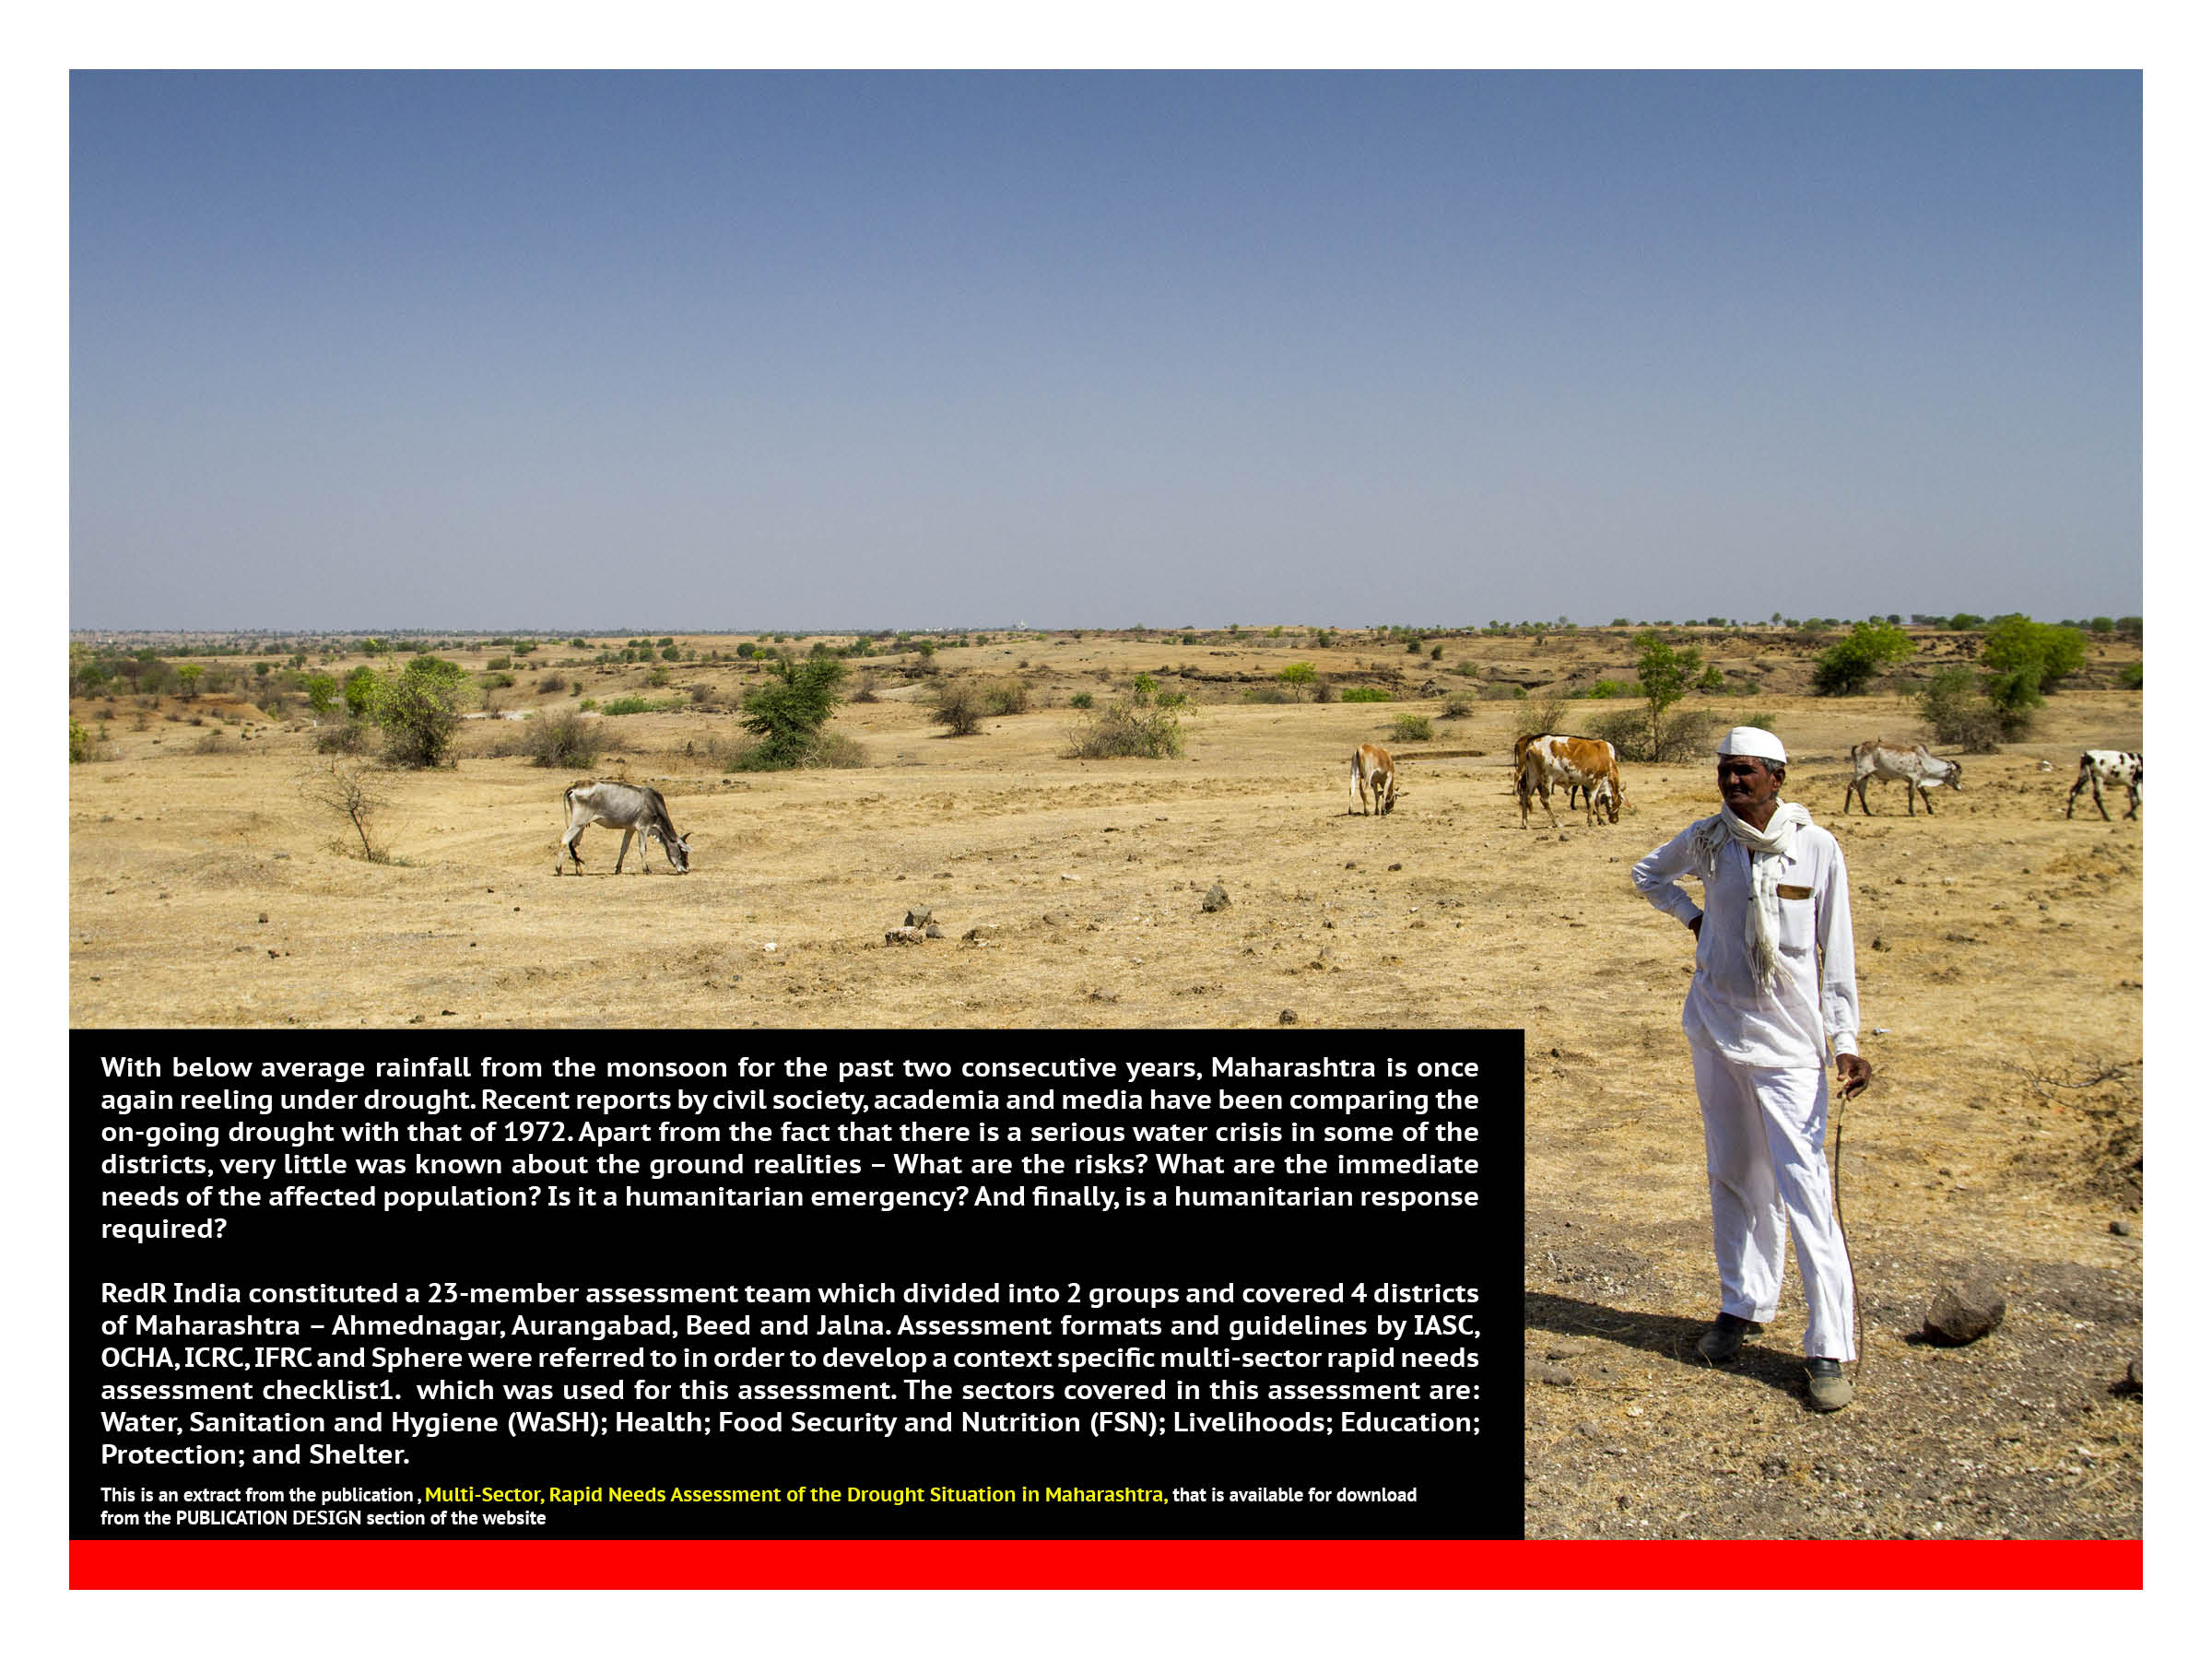 Maharashtra Drought, India - RedR India Drought Assessment